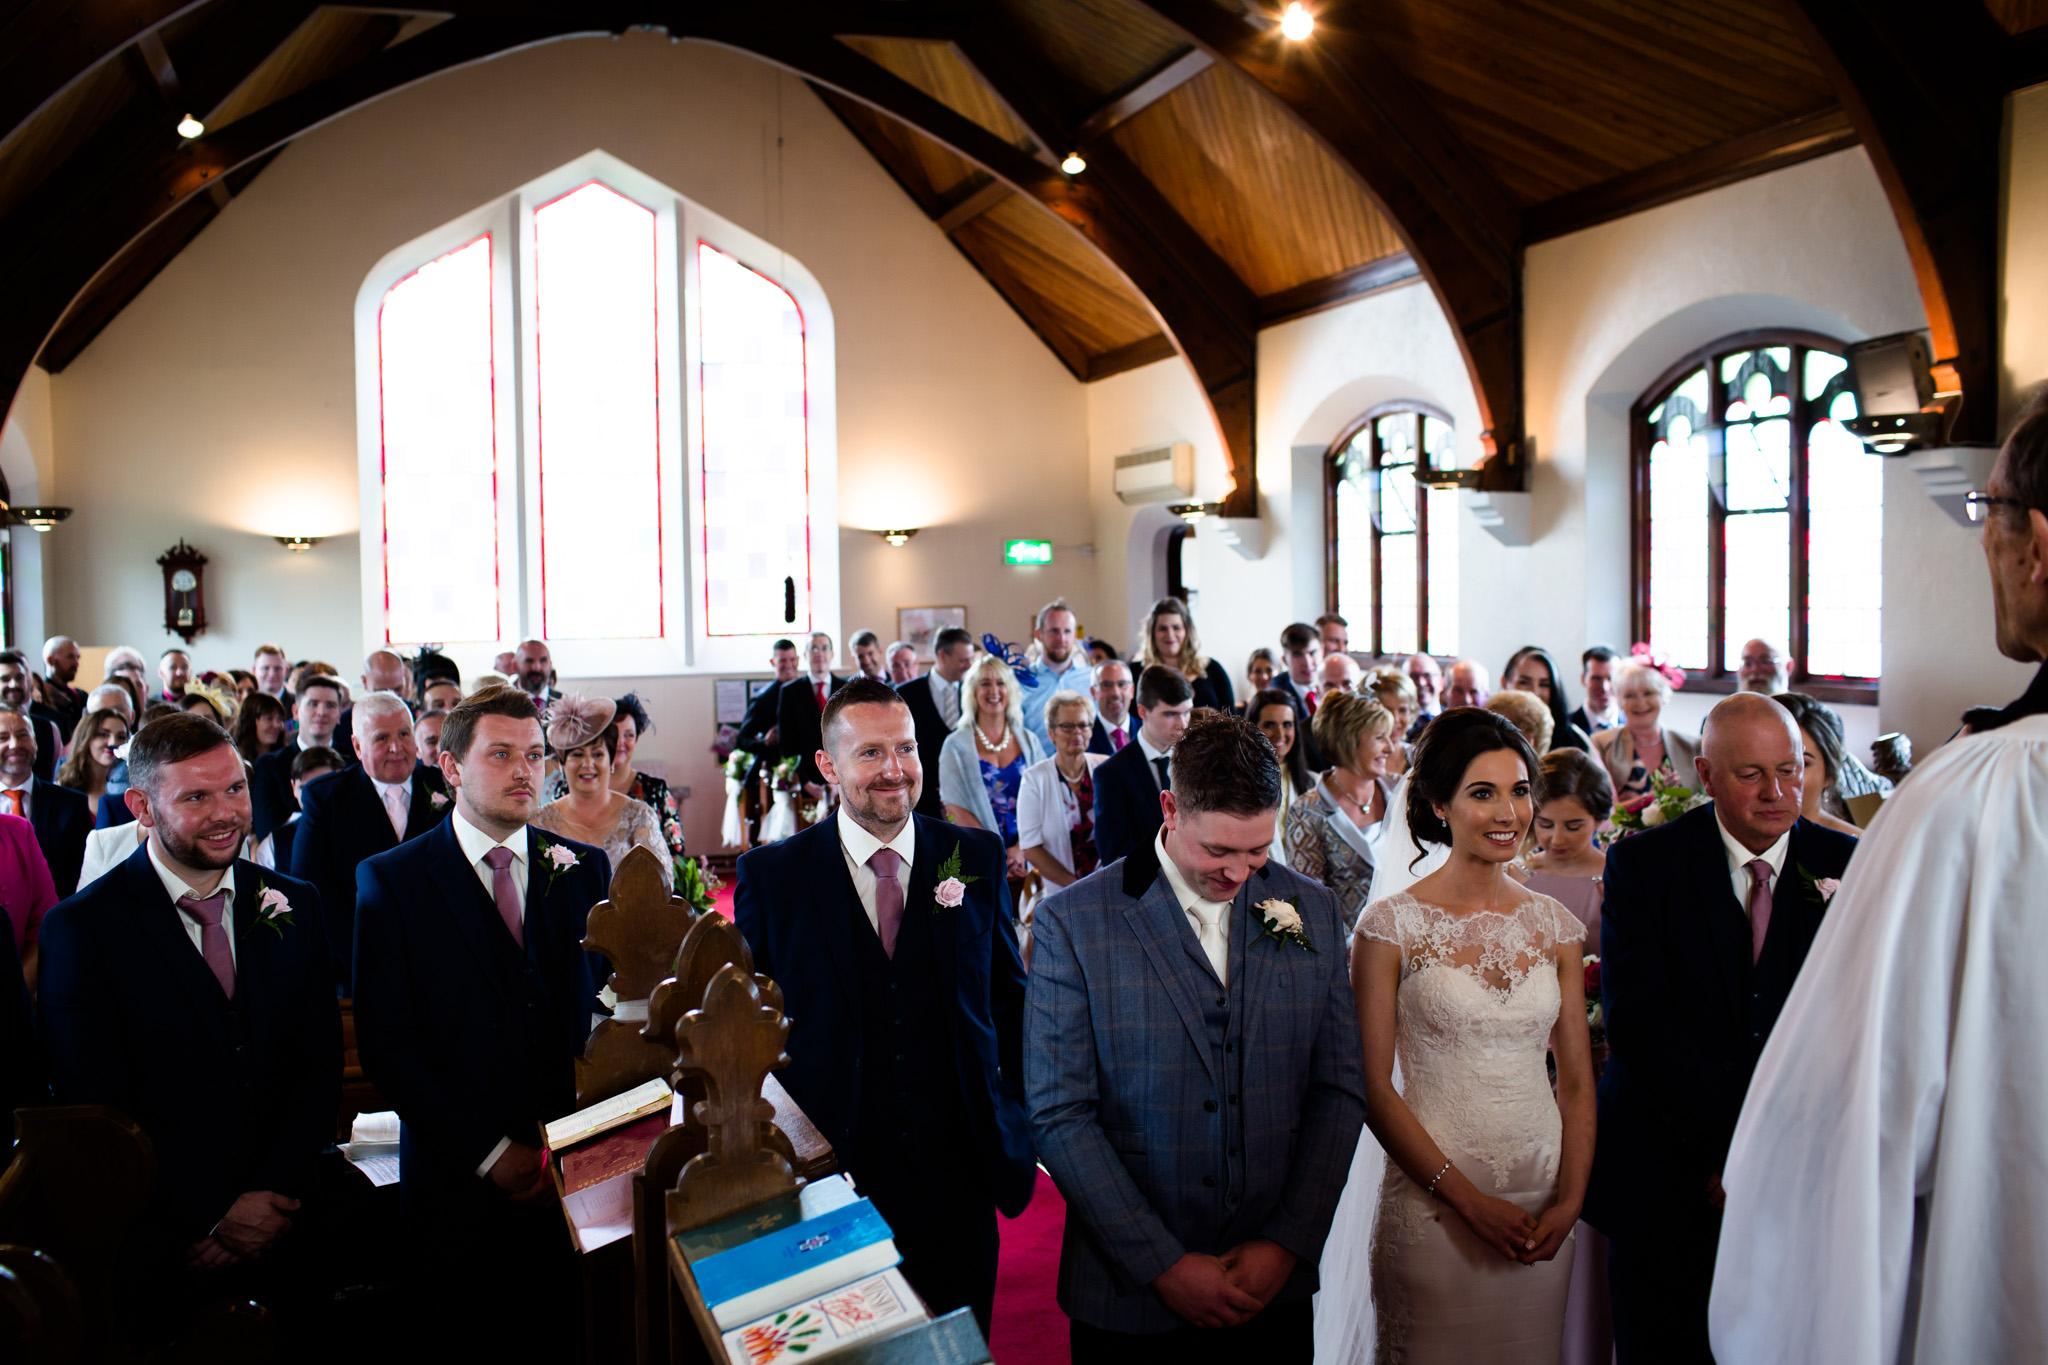 Mark_Barnes_Northern_Ireland_Wedding_Photography_Leighinmohr-house-hotel-ballymena_Wedding_Photography-21.jpg